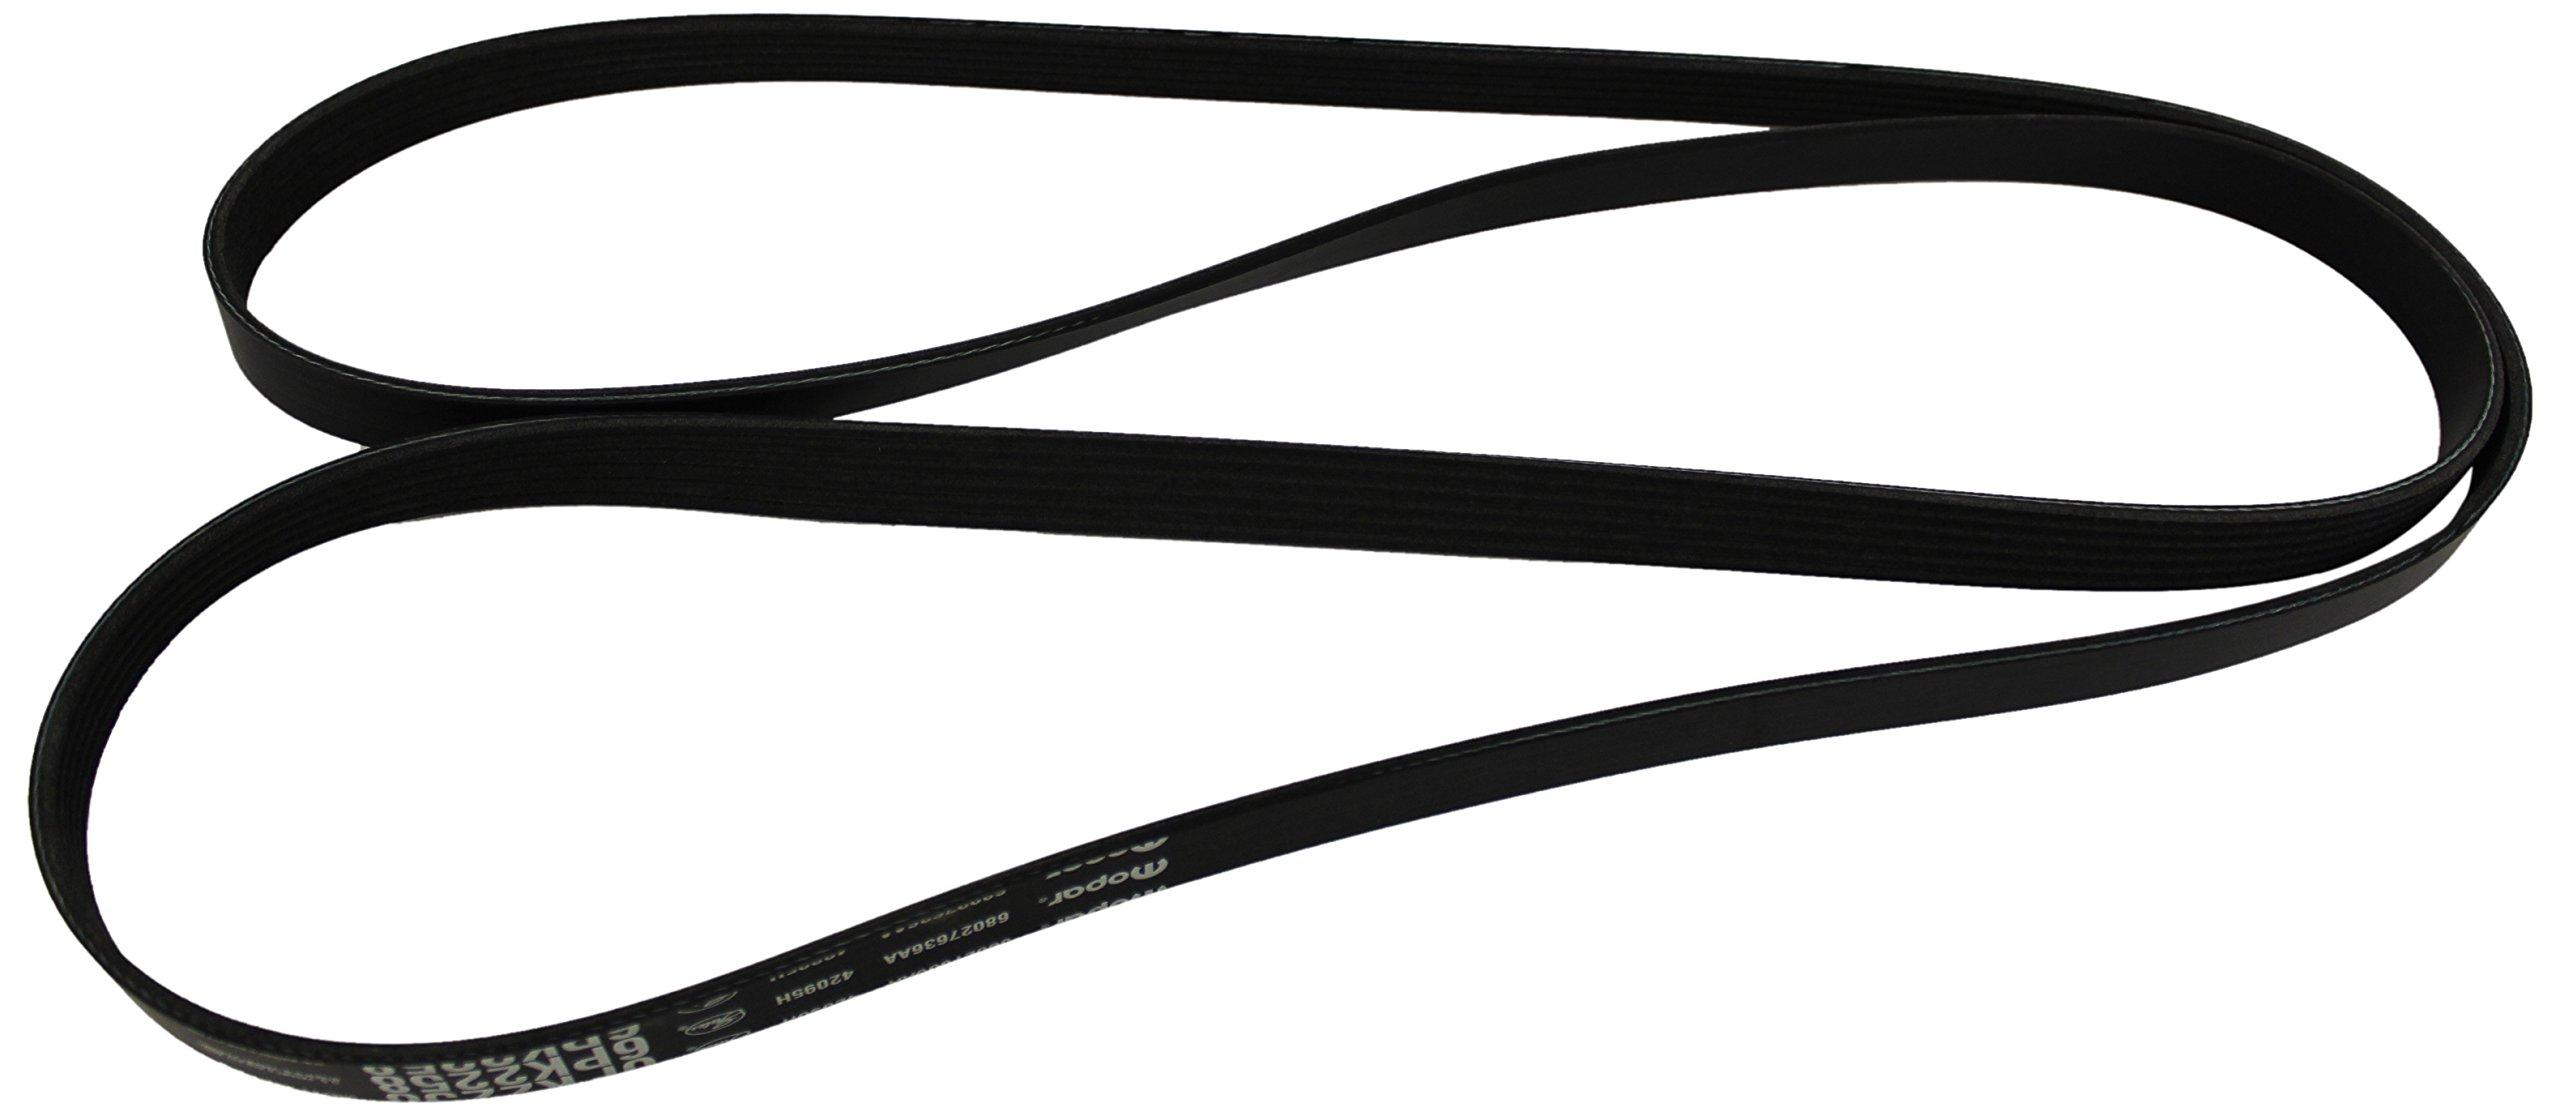 Genuine Chrysler 68027636AA Serpentine Belt by Chrysler